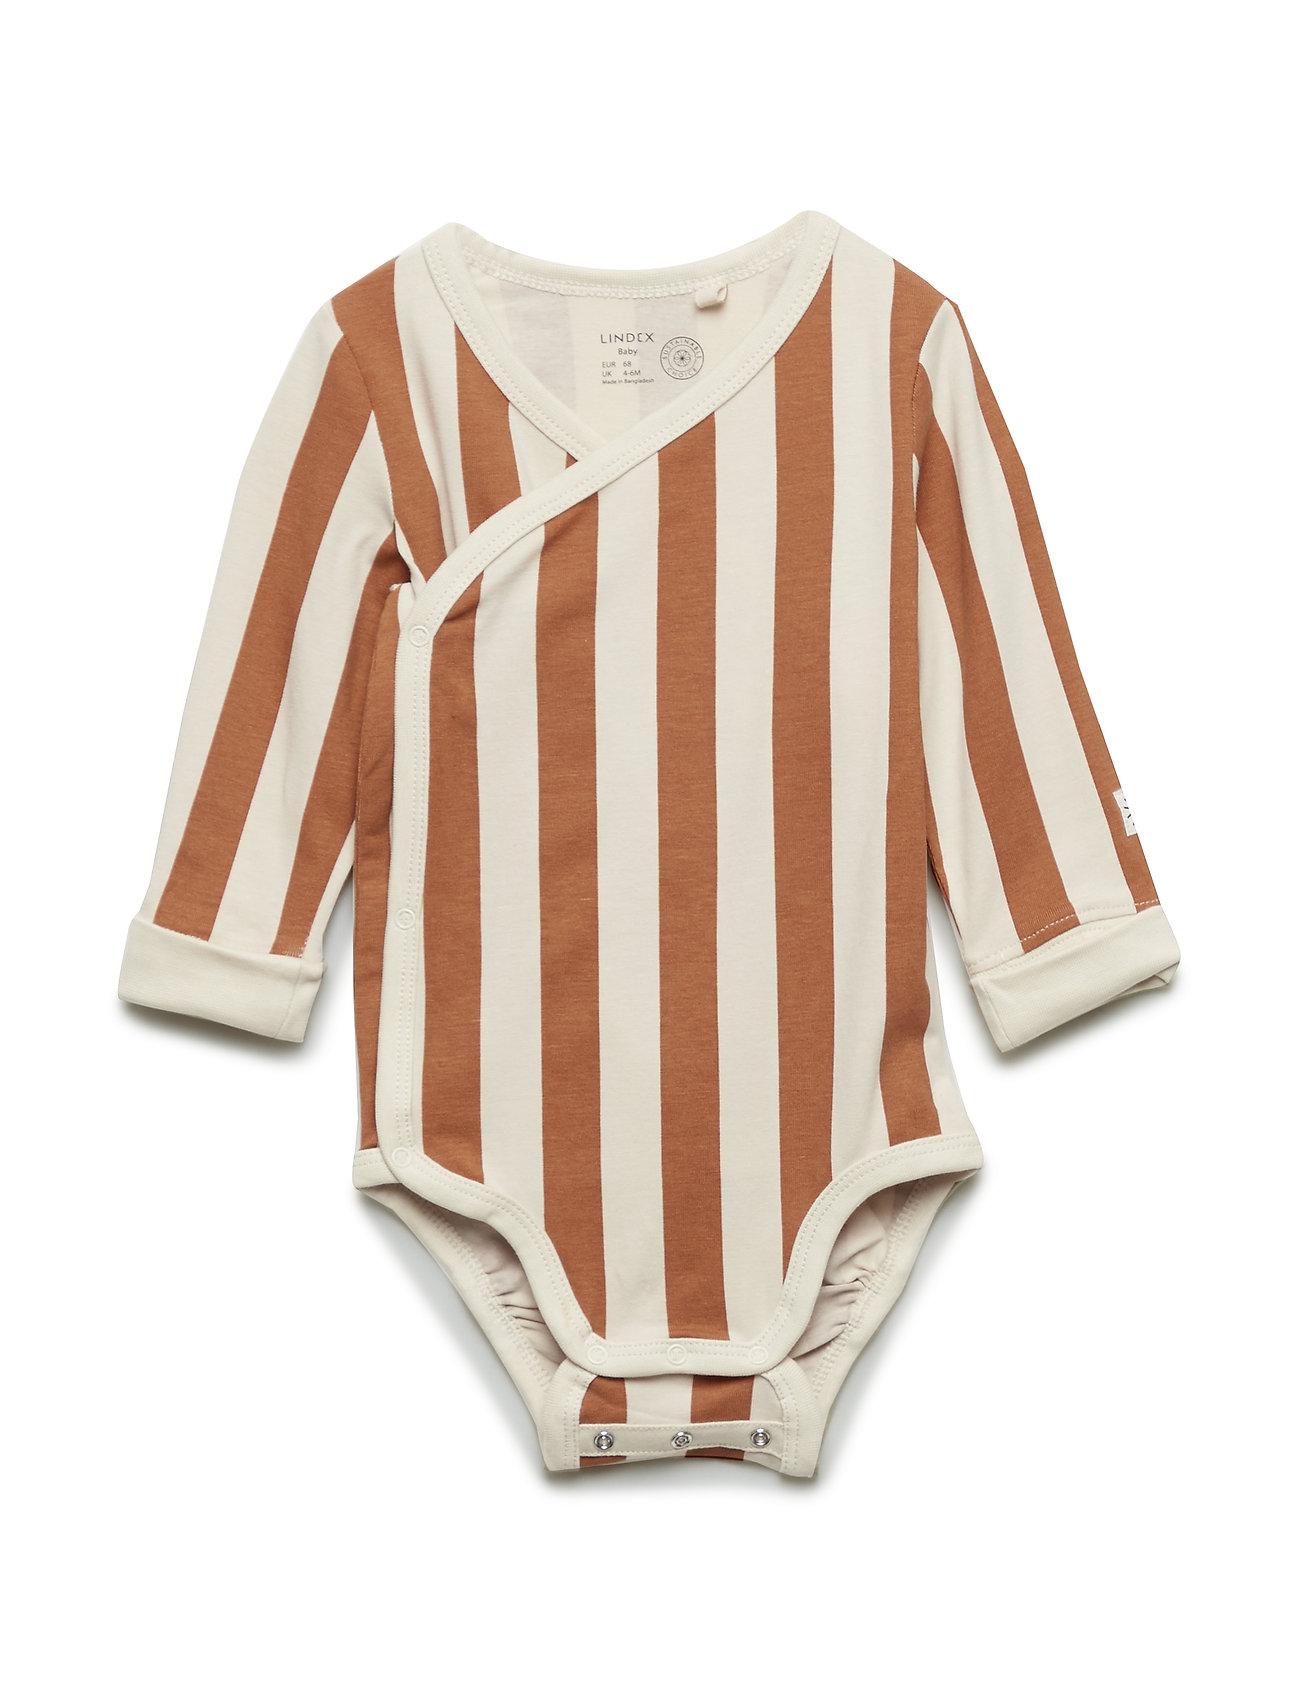 Lindex Body Wrap Block stripe - BROWN